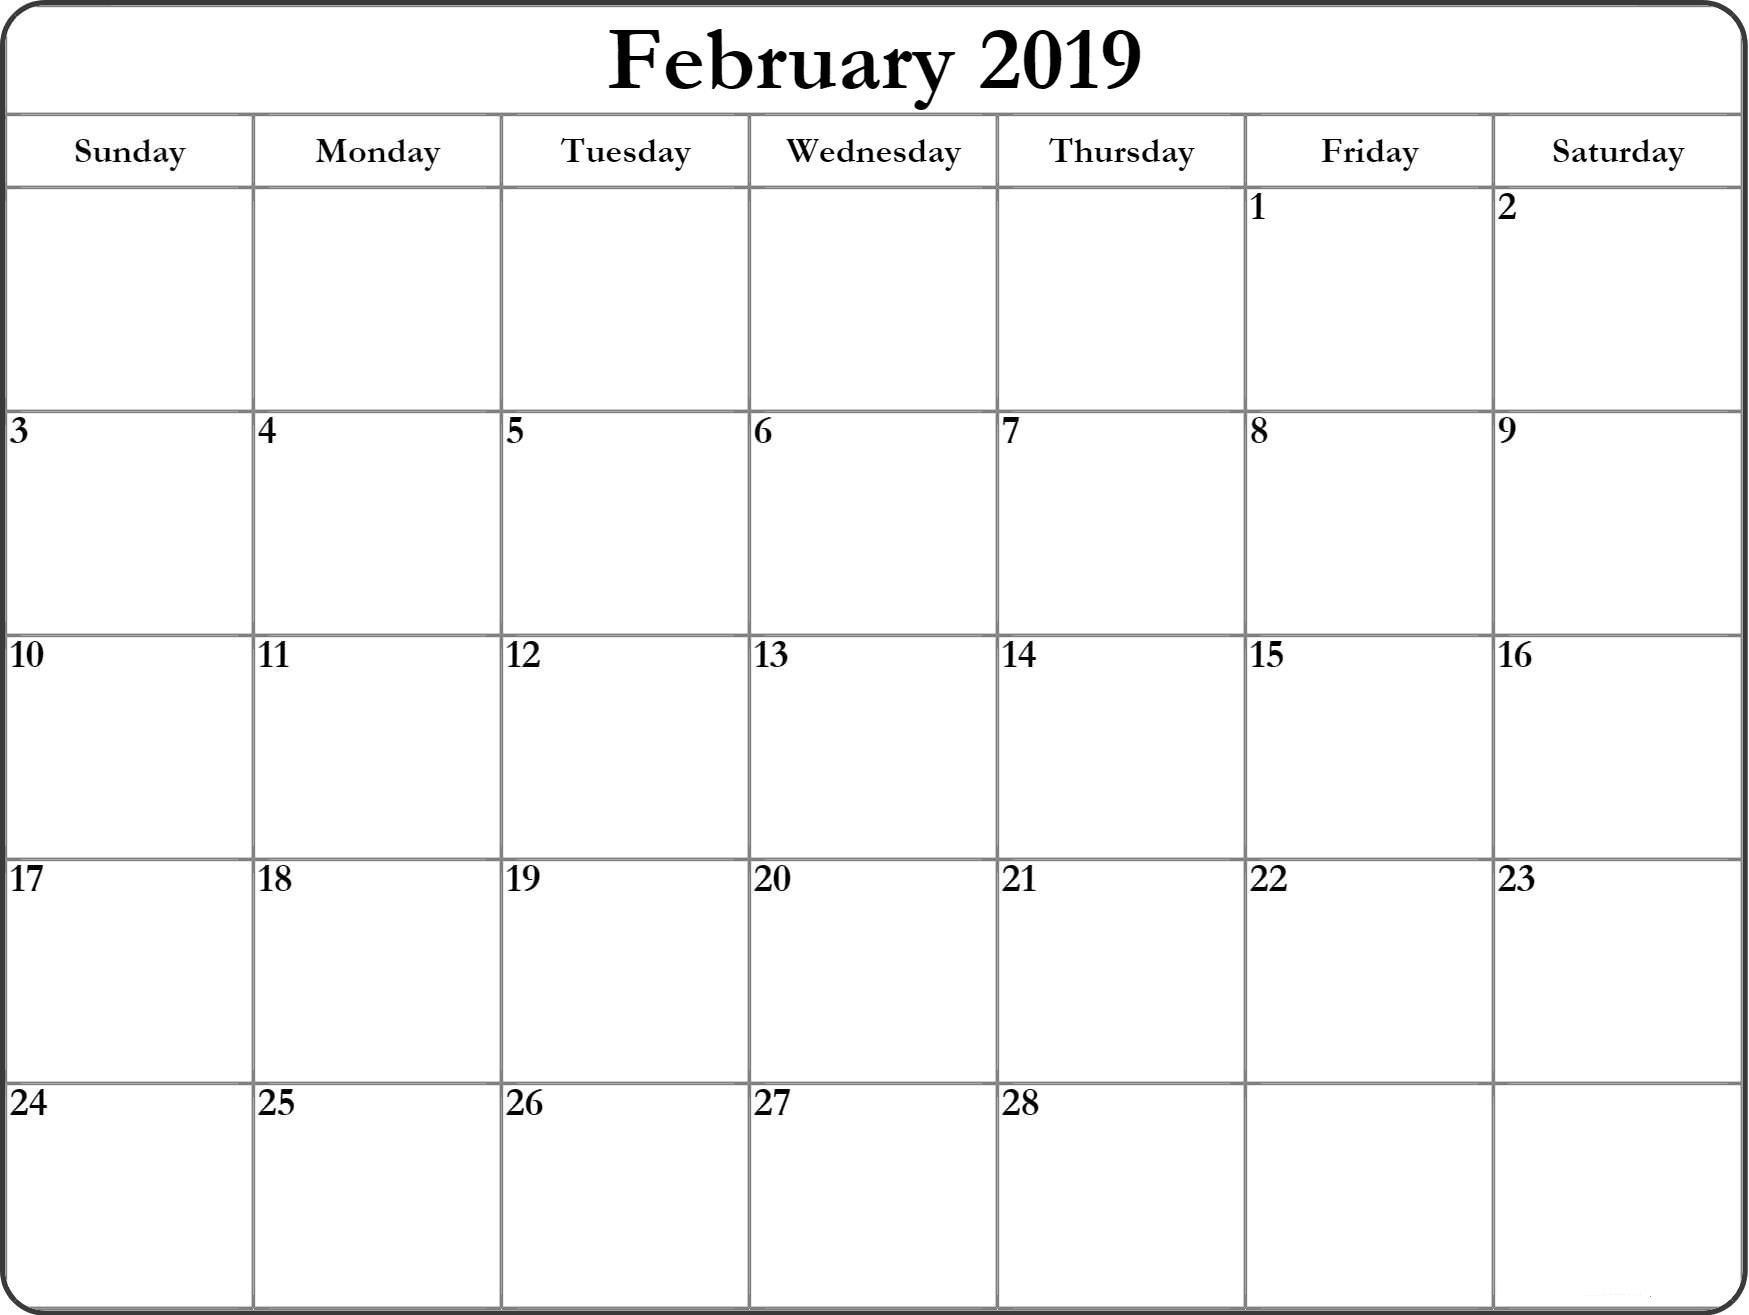 February 2019 Blank Editable Calendar – Free Printable Calendar Calendar 2019 Blank